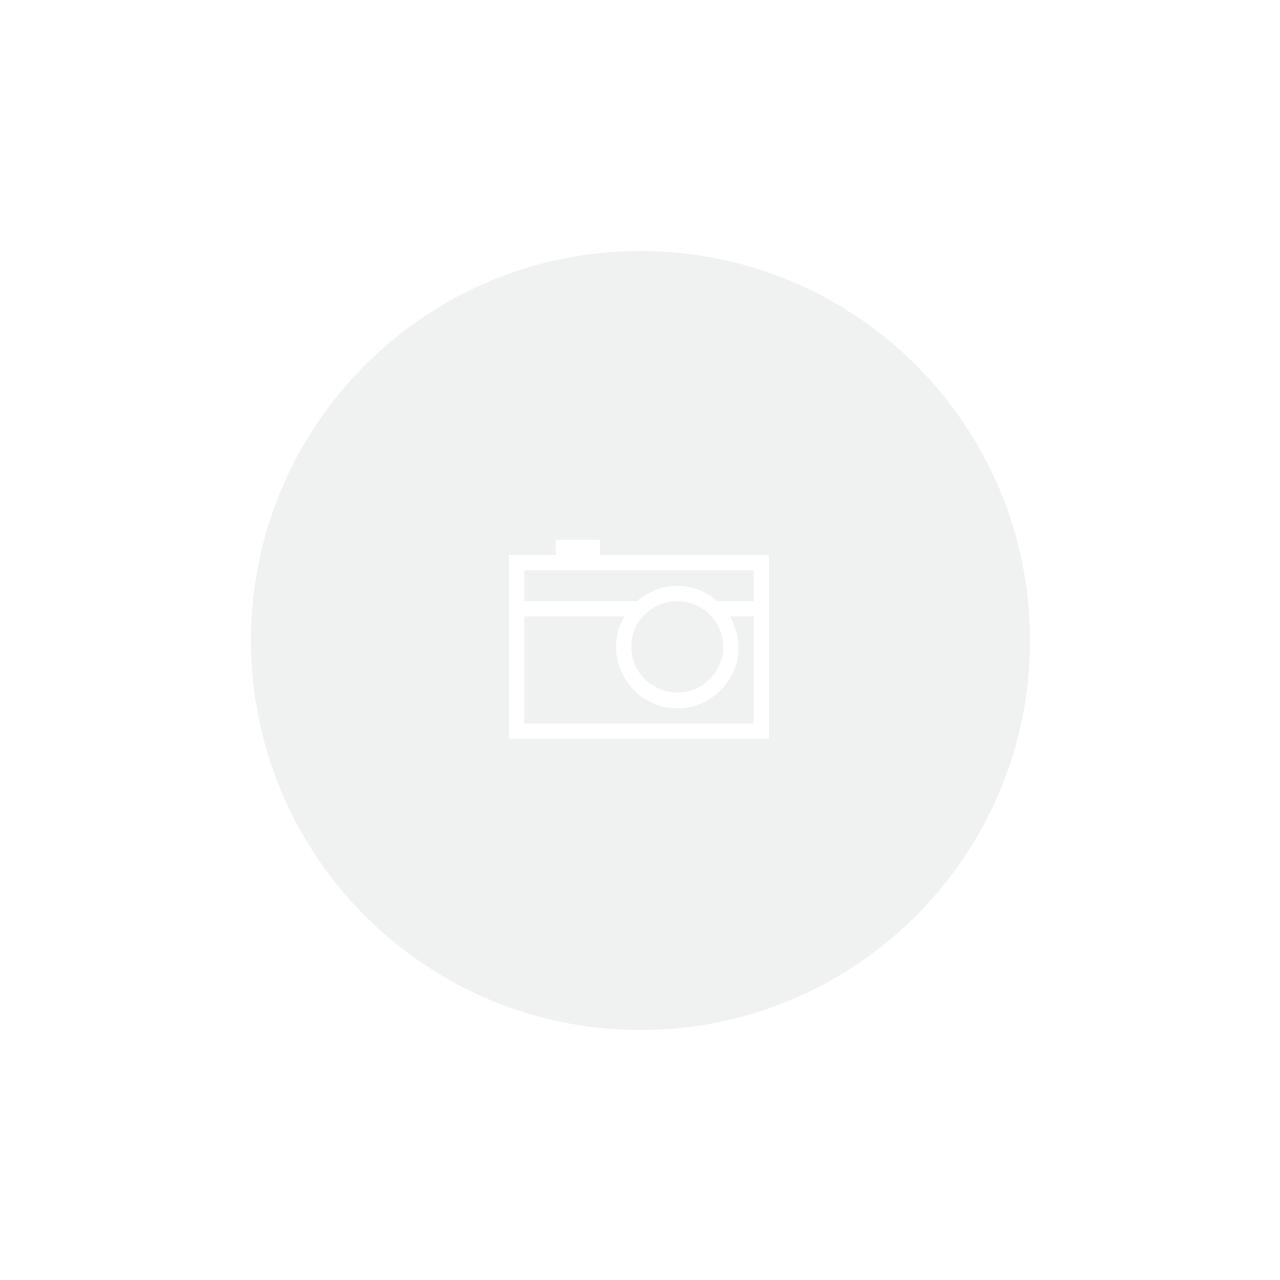 Canaleta Tramontina - 20x10x2000mm com fita dupla face